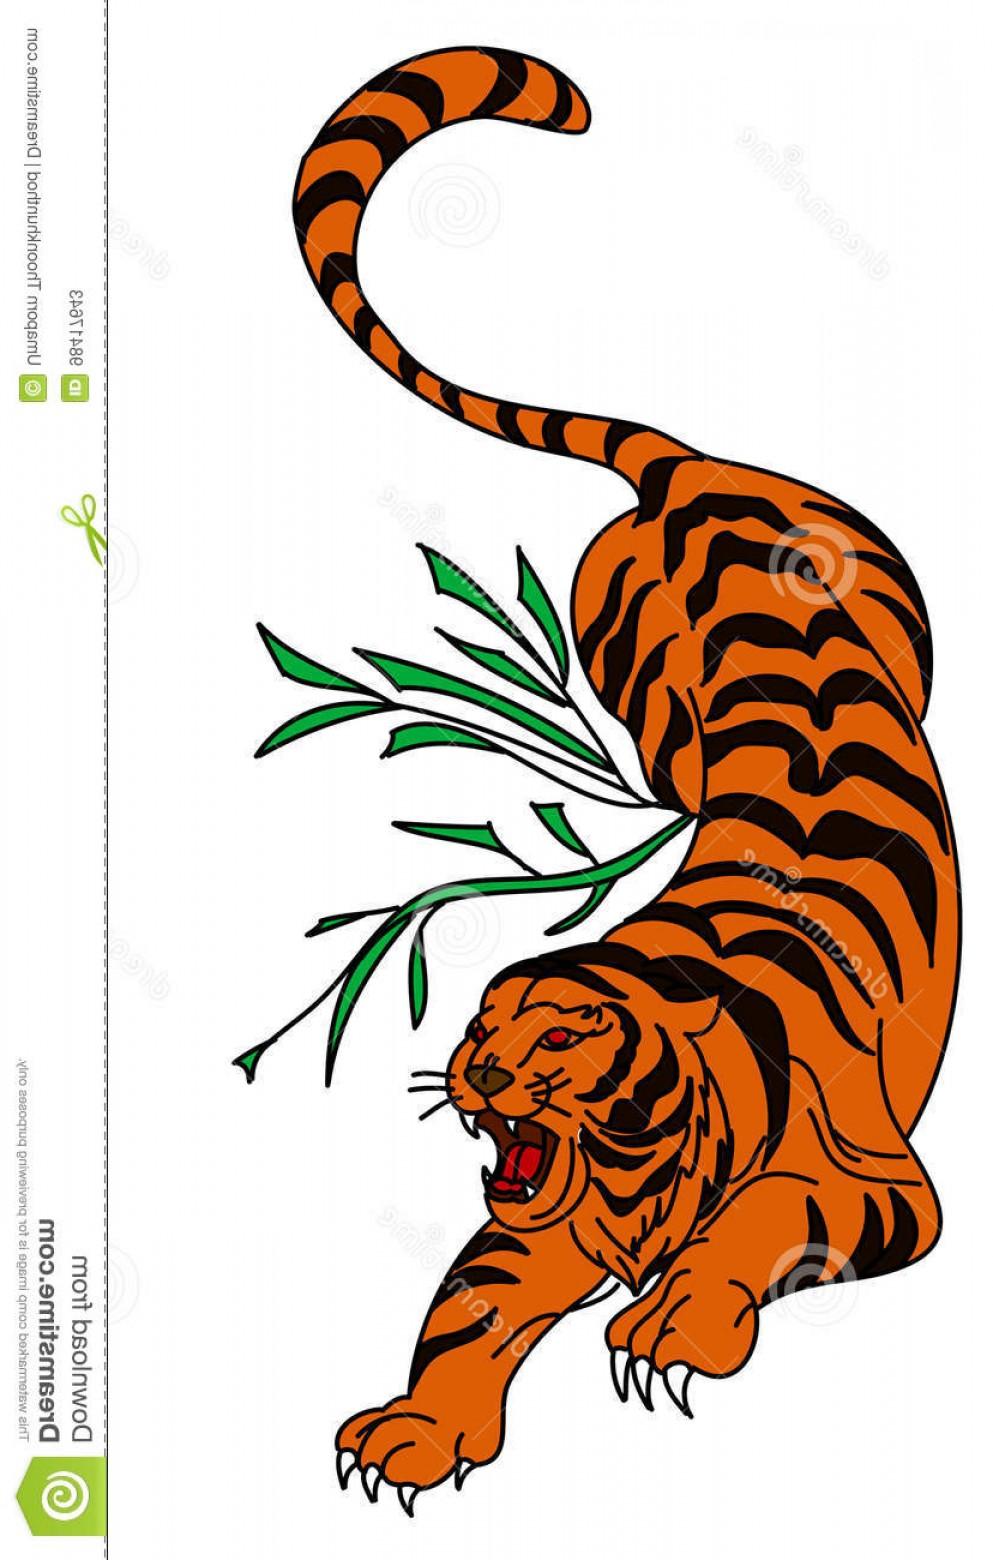 993x1560 Stock Illustration Tiger Vector Tattoo Design White Background